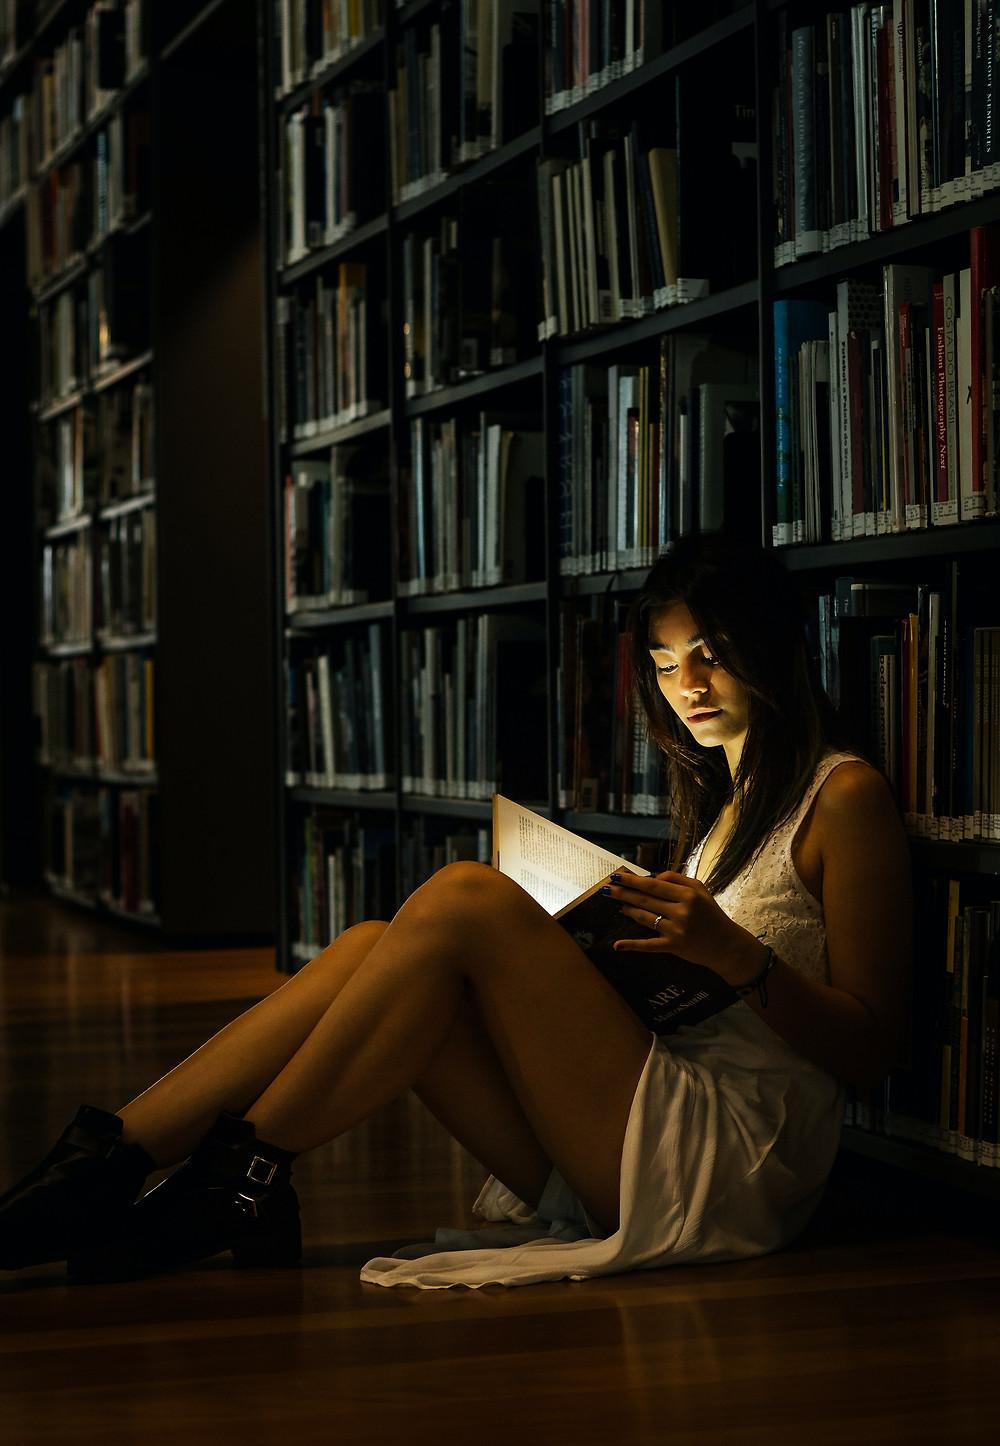 book books self-help growth mindset